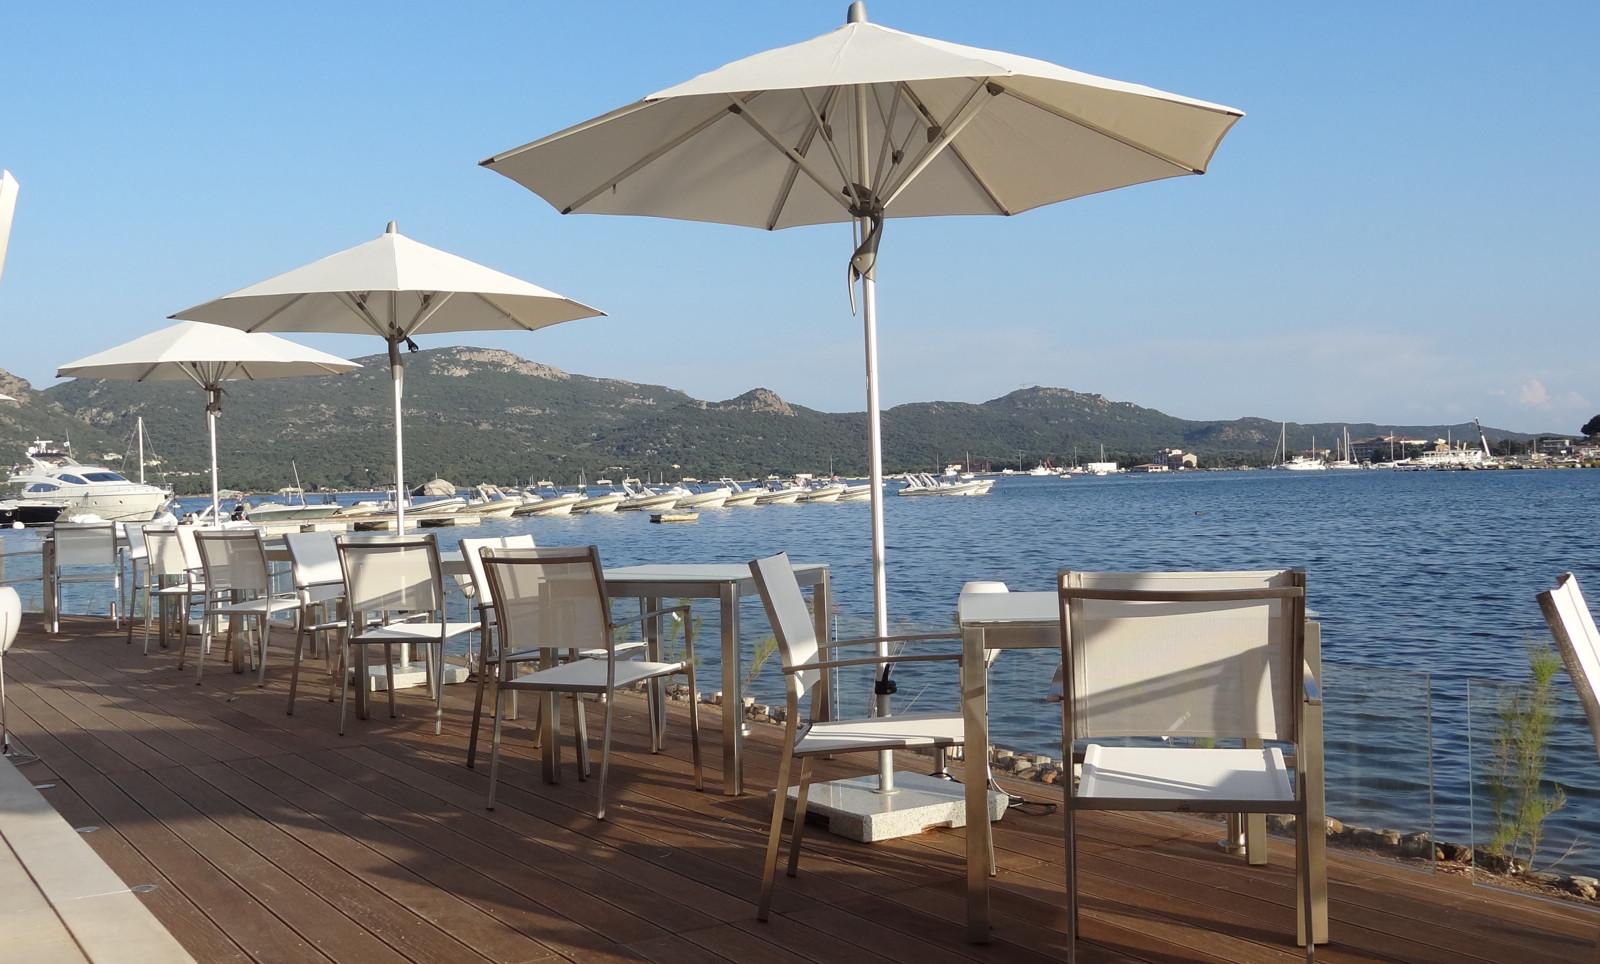 Hotel don cesar porto vecchio corsica borek